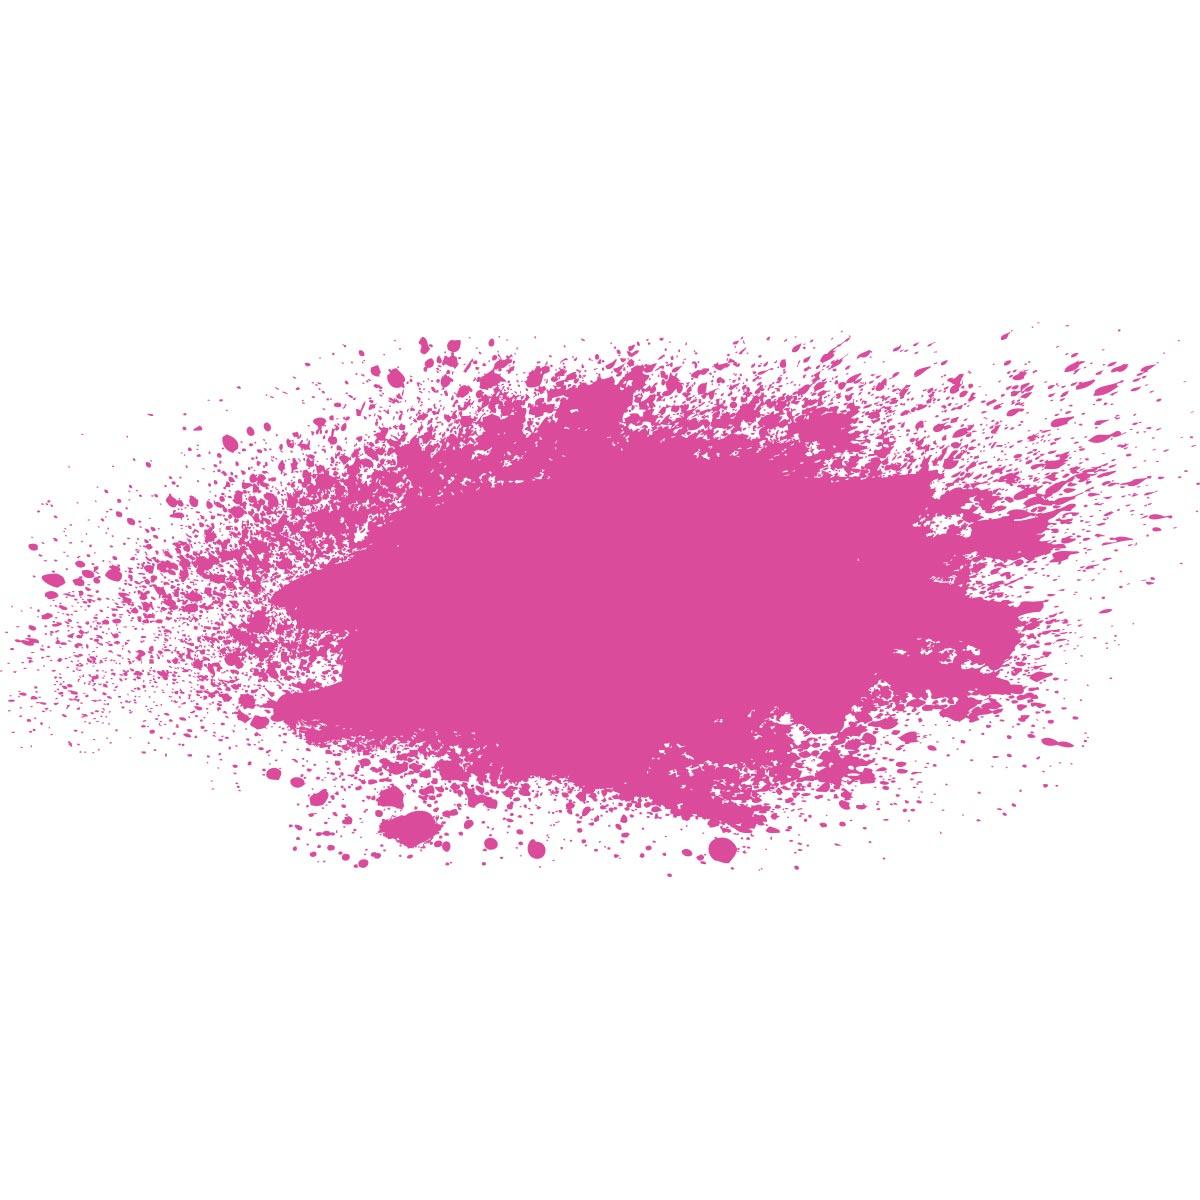 FolkArt ® Stencil Spray™ Acrylic Paint - Hot Pink, 2 oz.